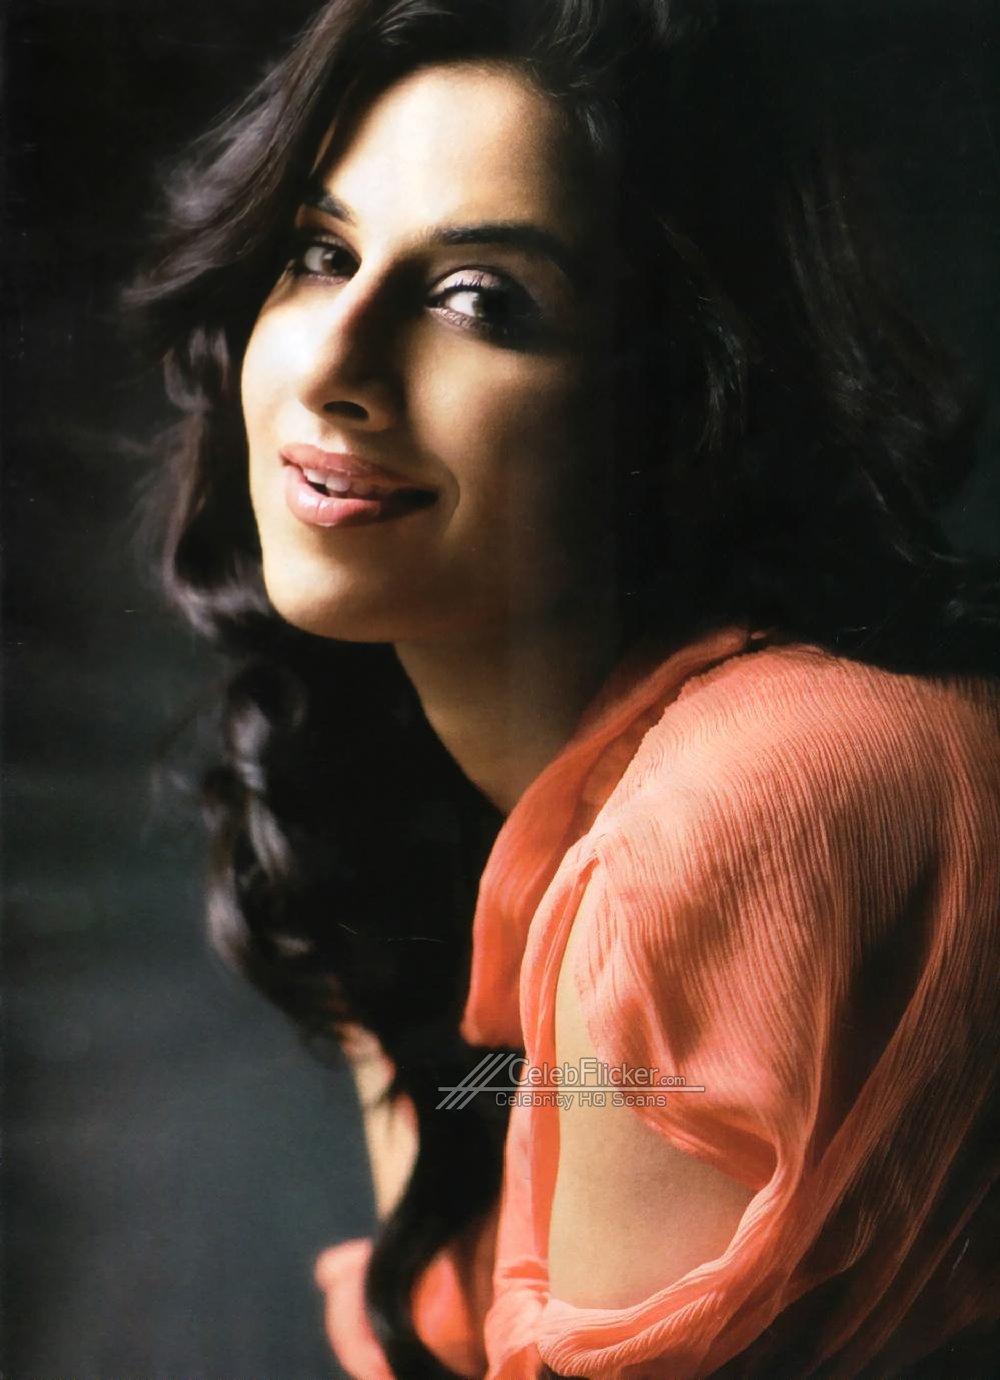 Bollywood Stars Vidya Balan Photo 3 2011 Hot Pics In -6249